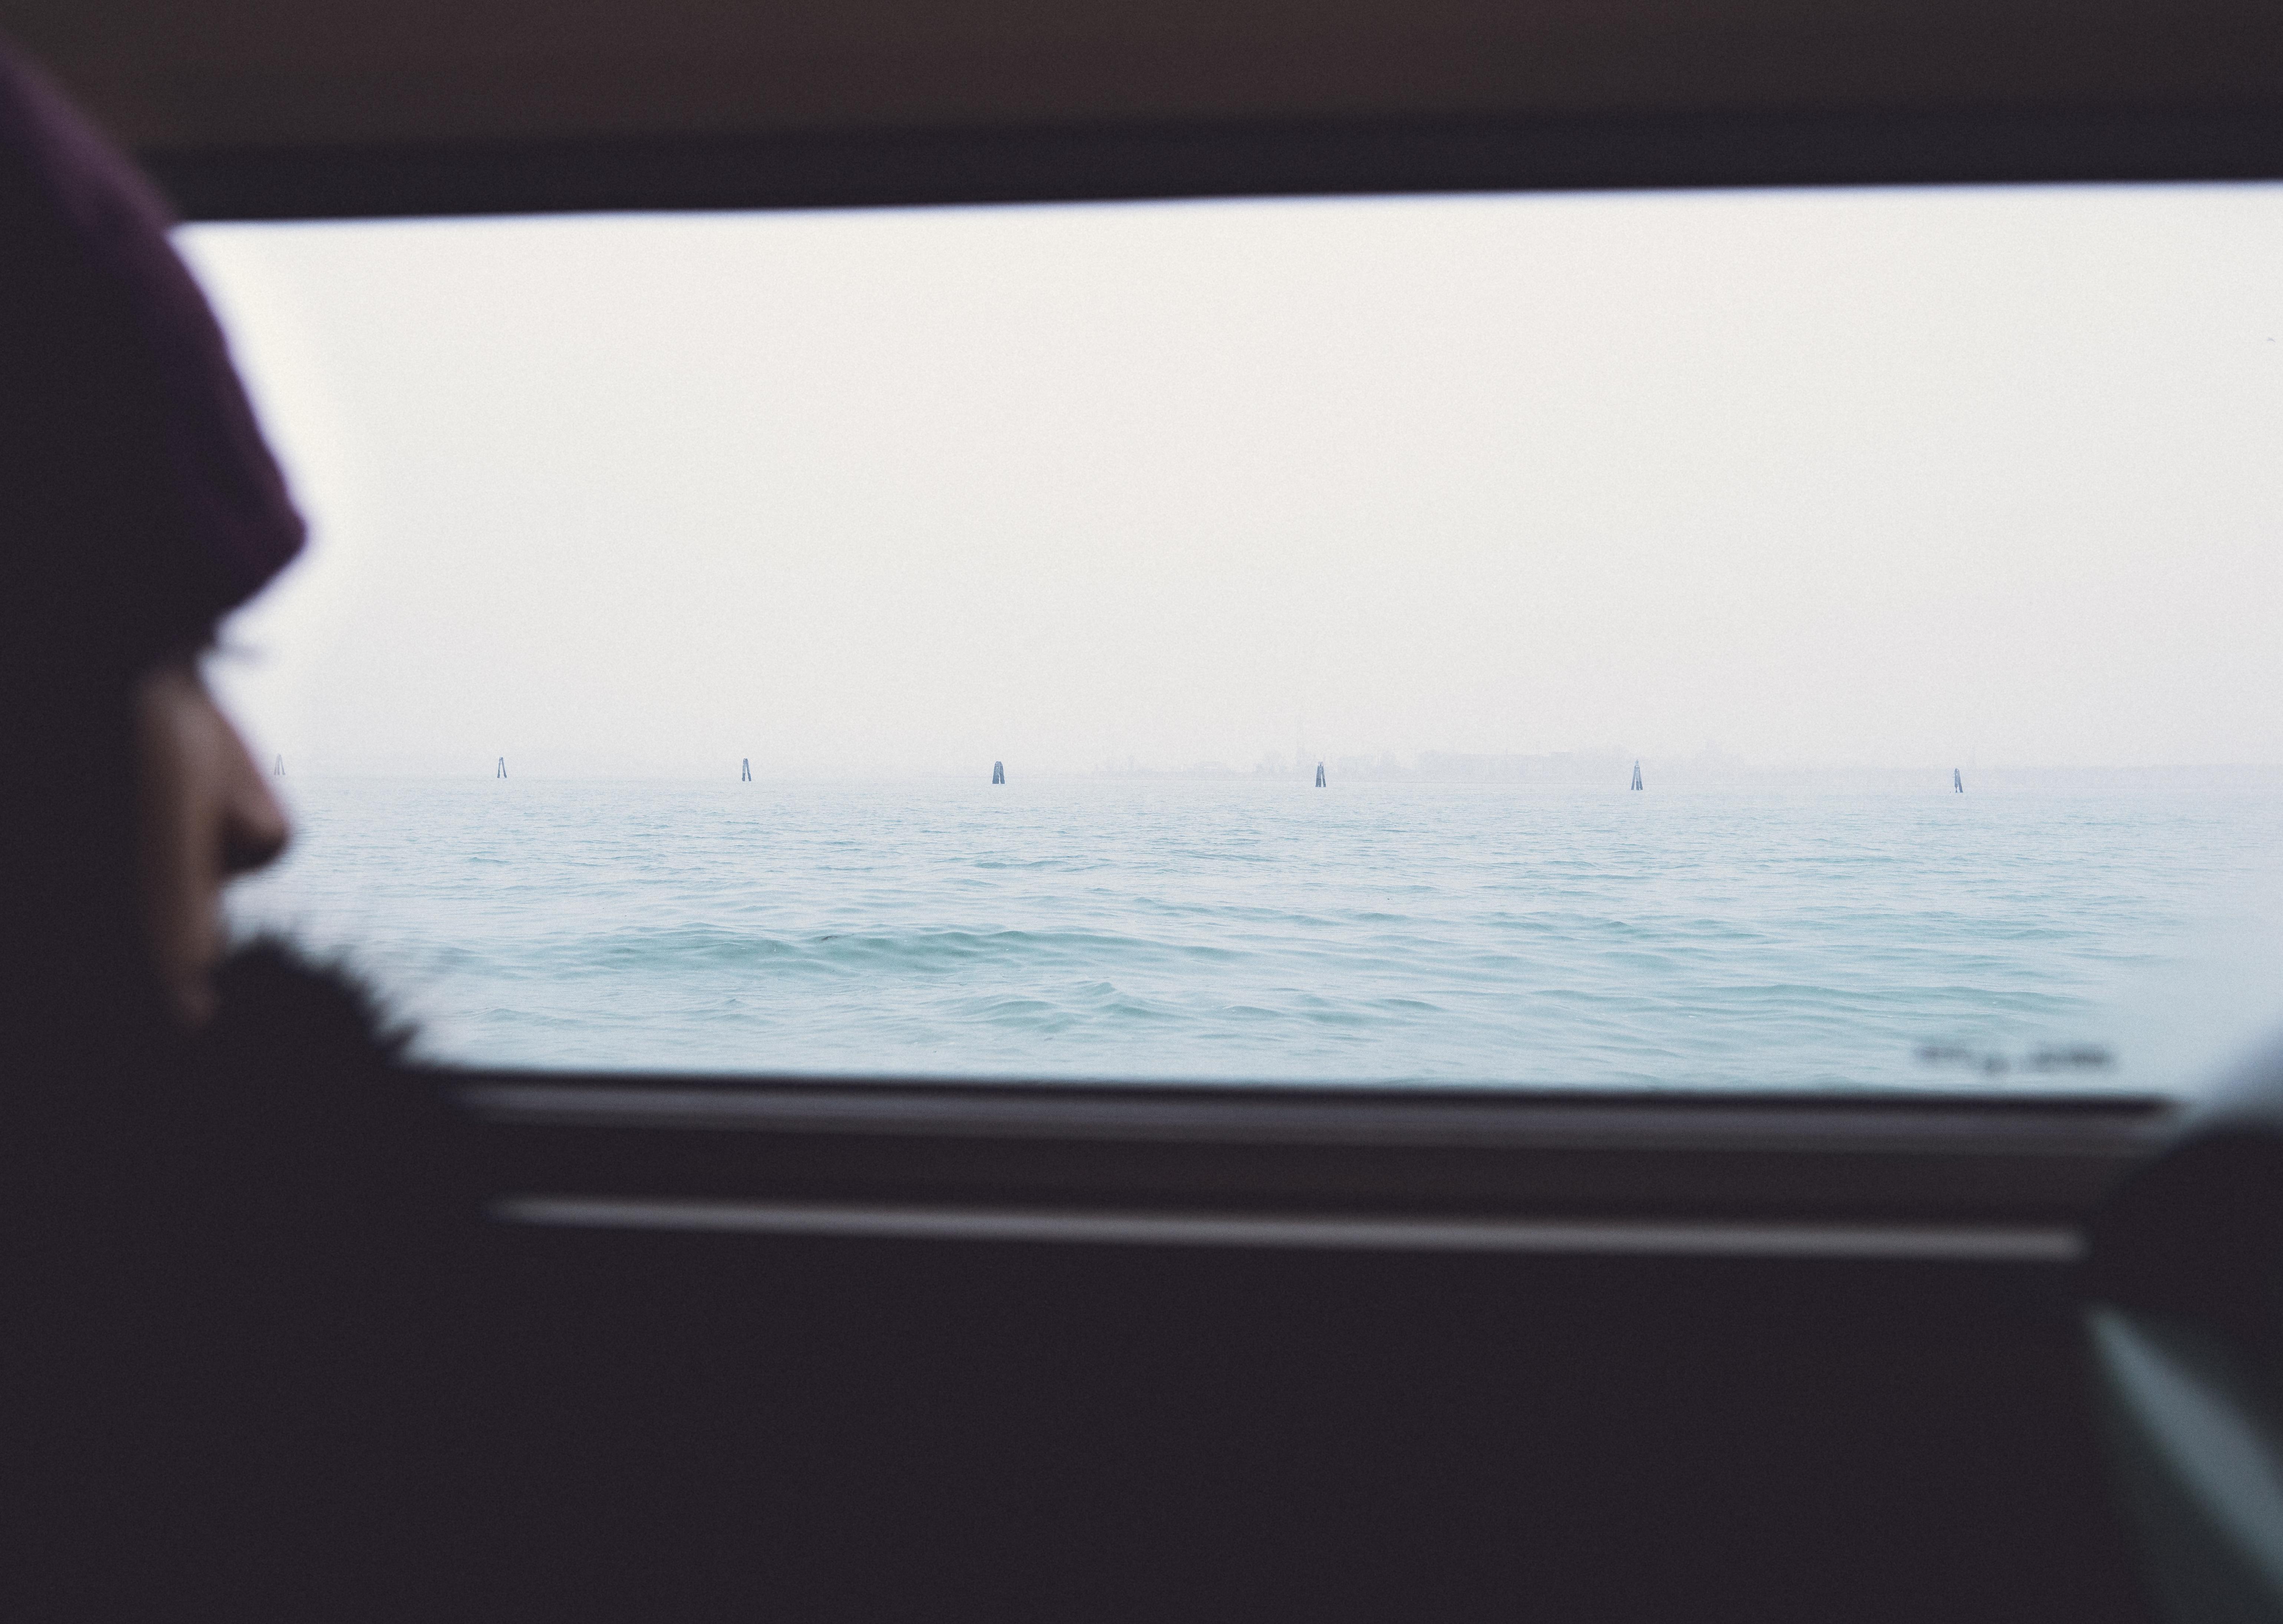 Fotos gratis : mar, Oceano, persona, ligero, blanco, ventana ...